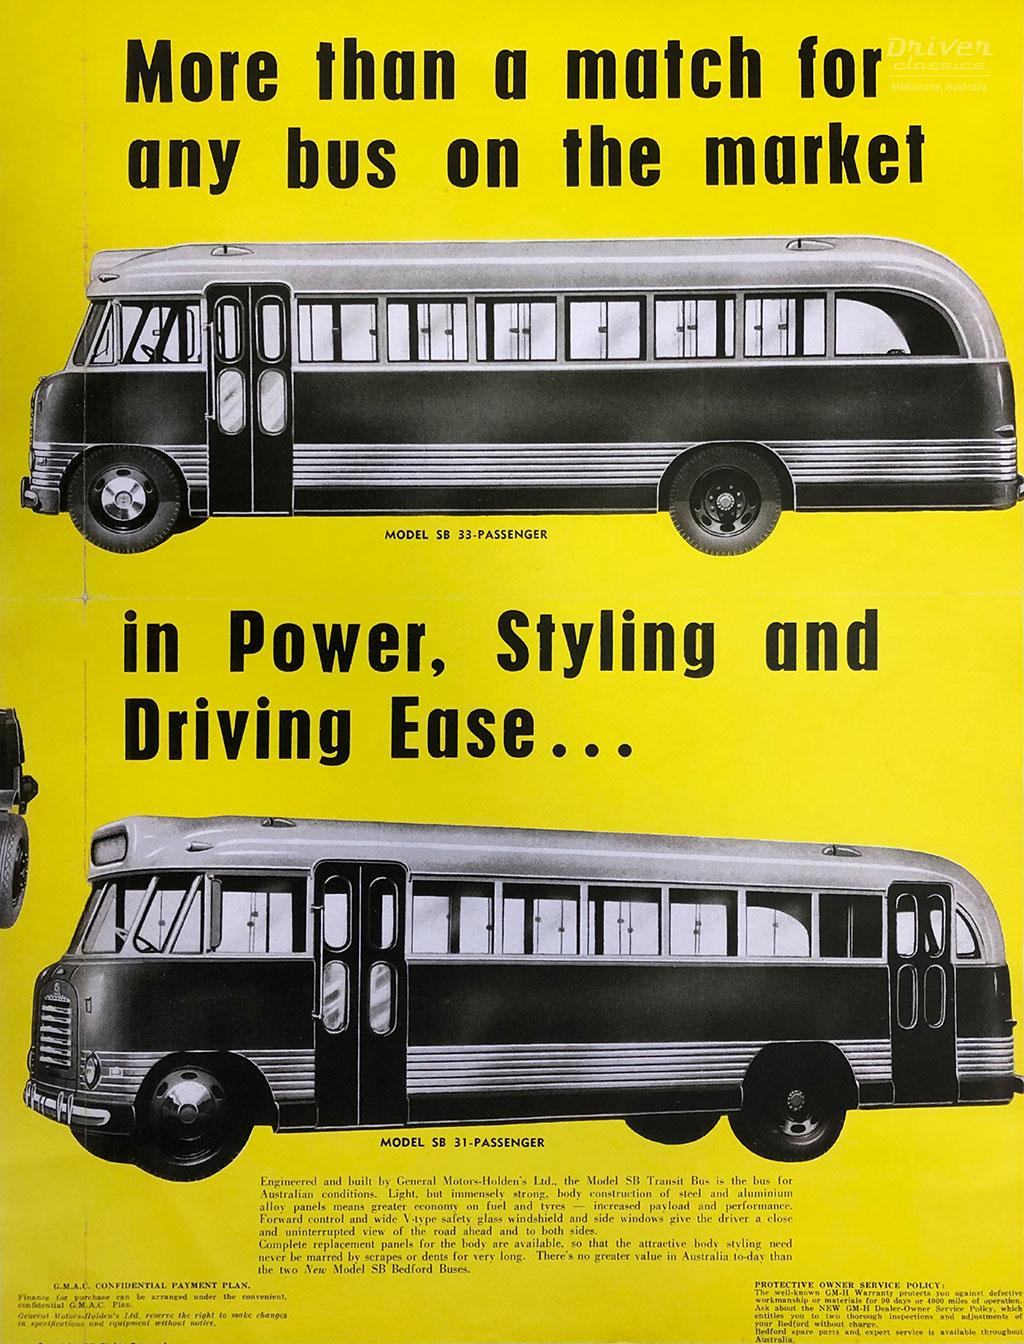 1952 Brochure for GM-H's Bedford SB 'flat screen' bus.